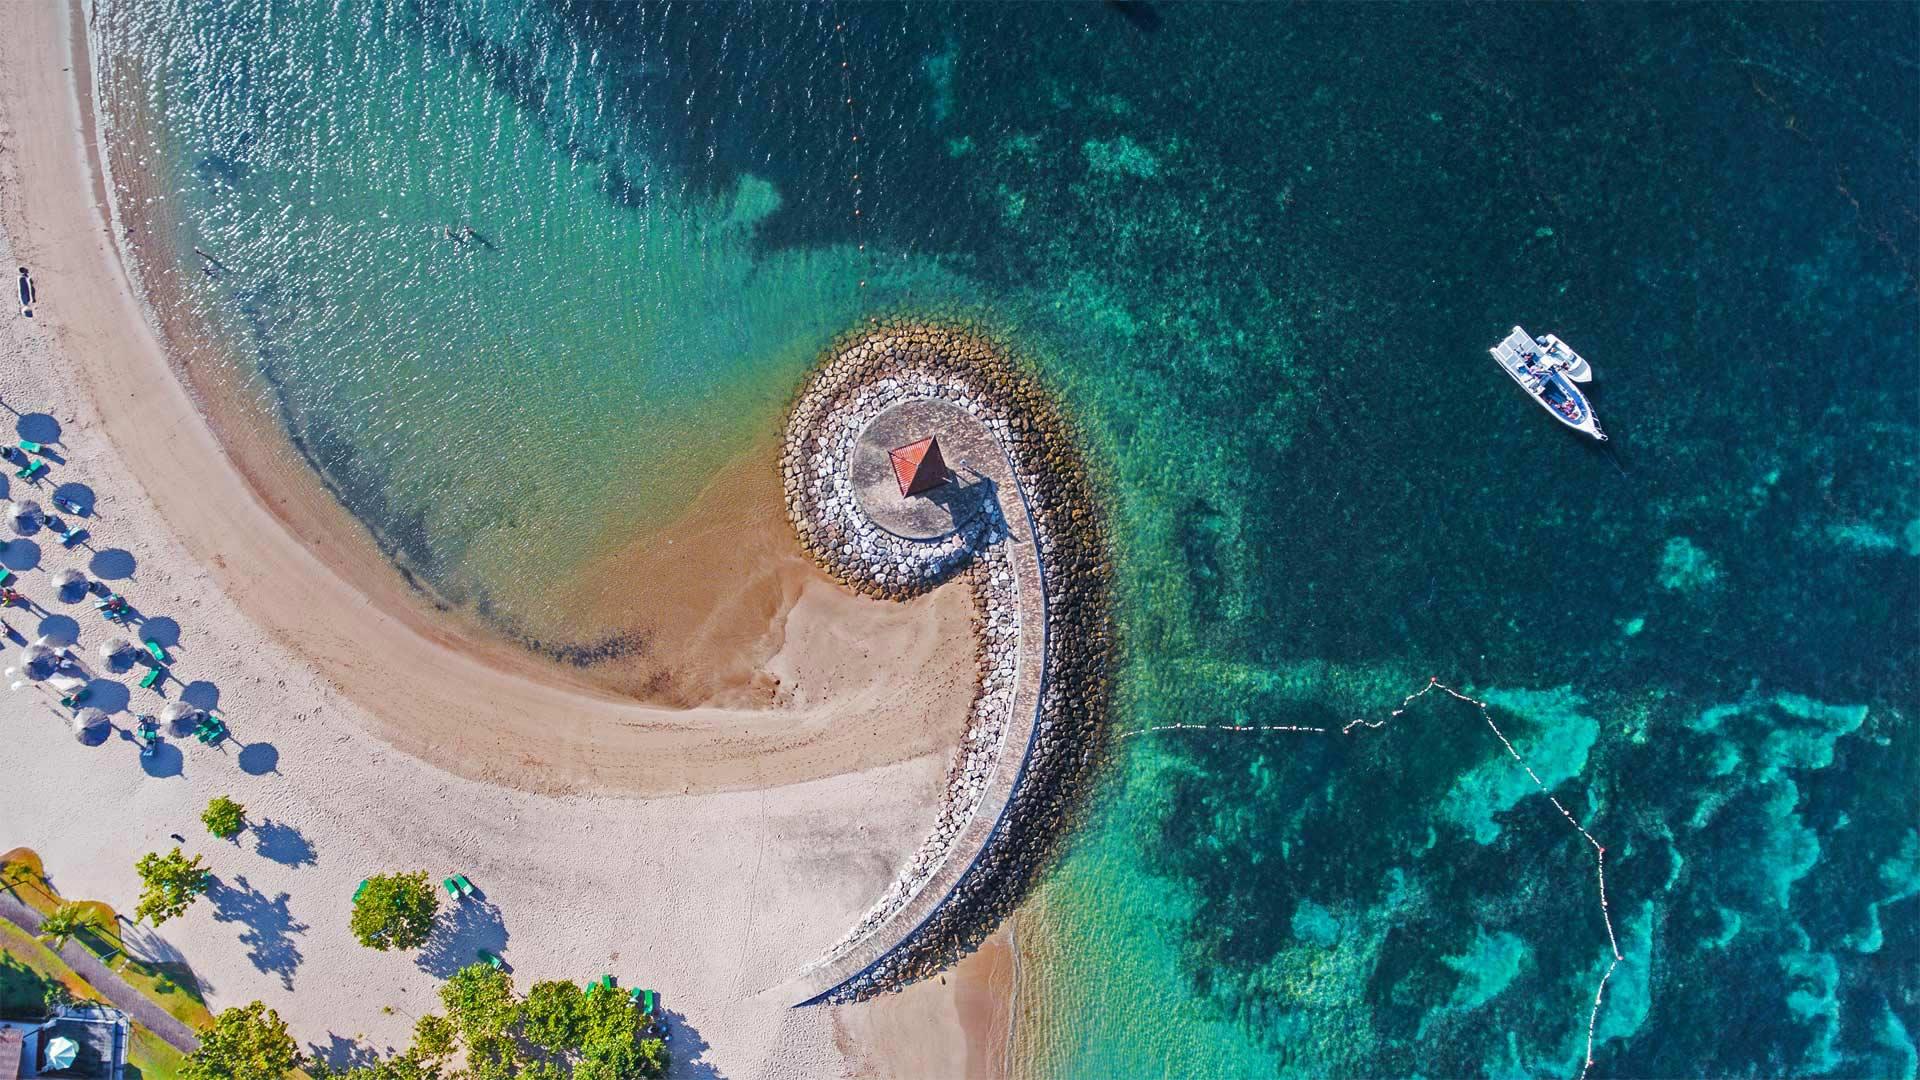 Nusa Dua coast with breakwater, Bali, Indonesia (© Dkart/Getty Images)(Bing United States)